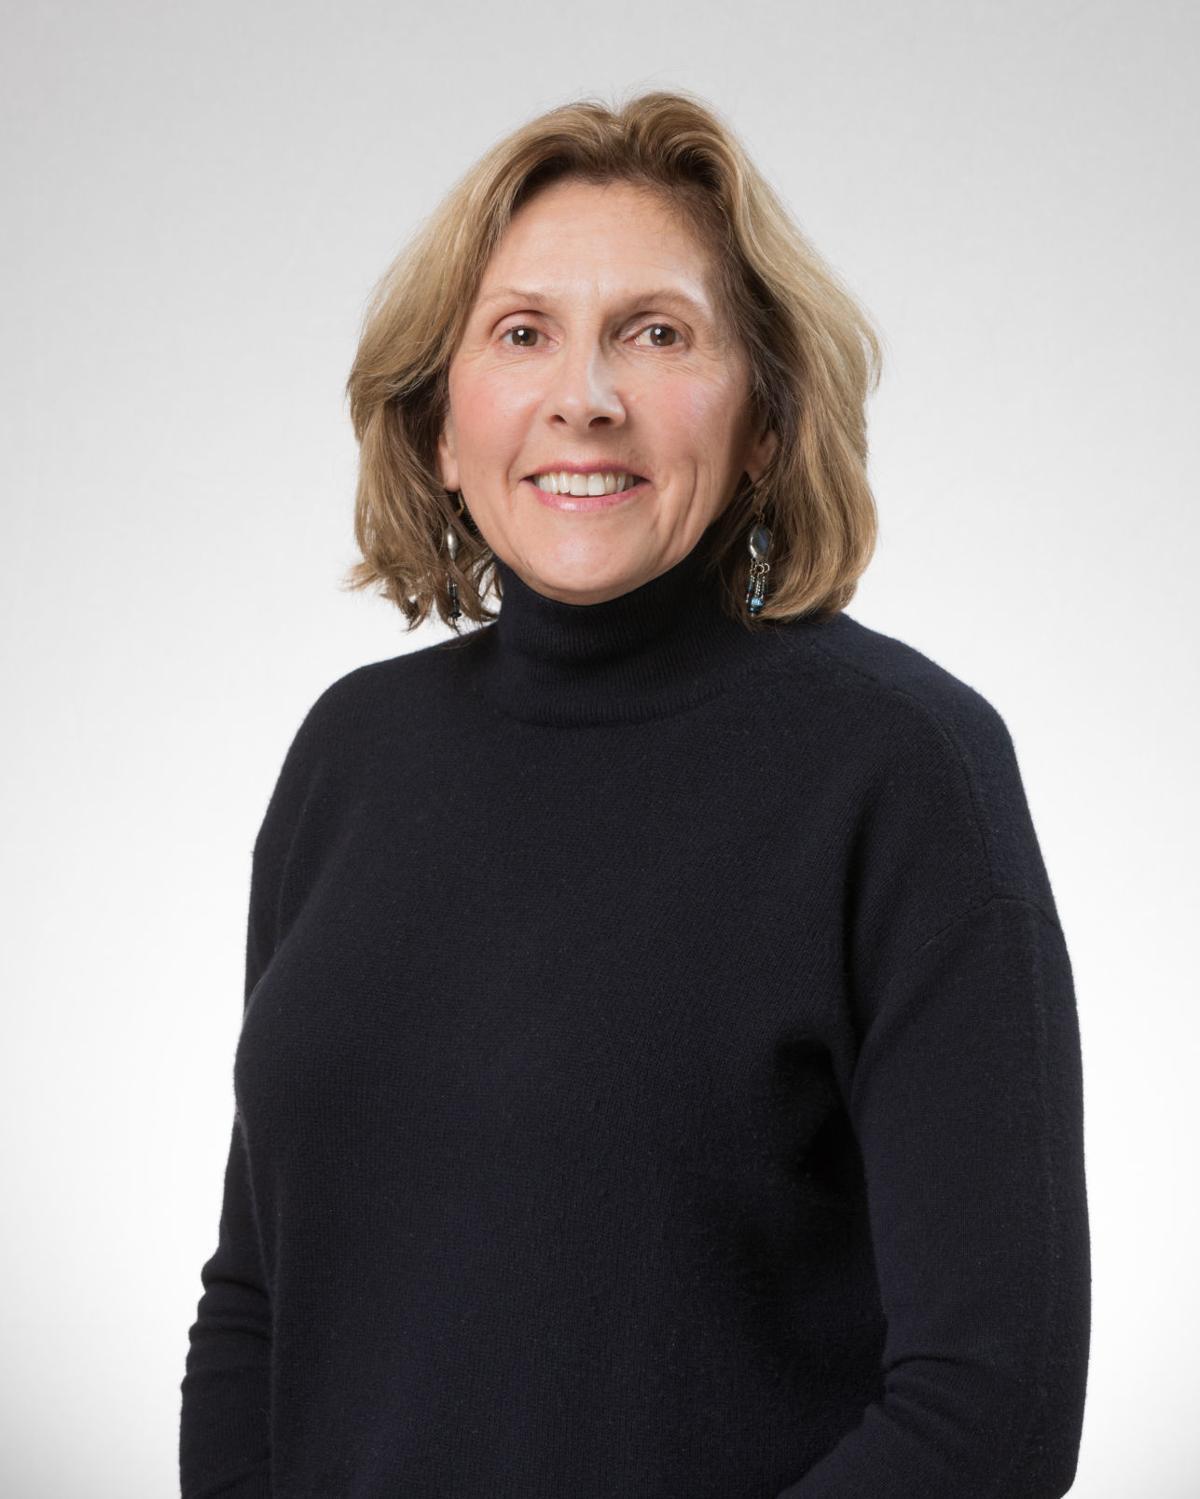 Rep. Denise Hayman